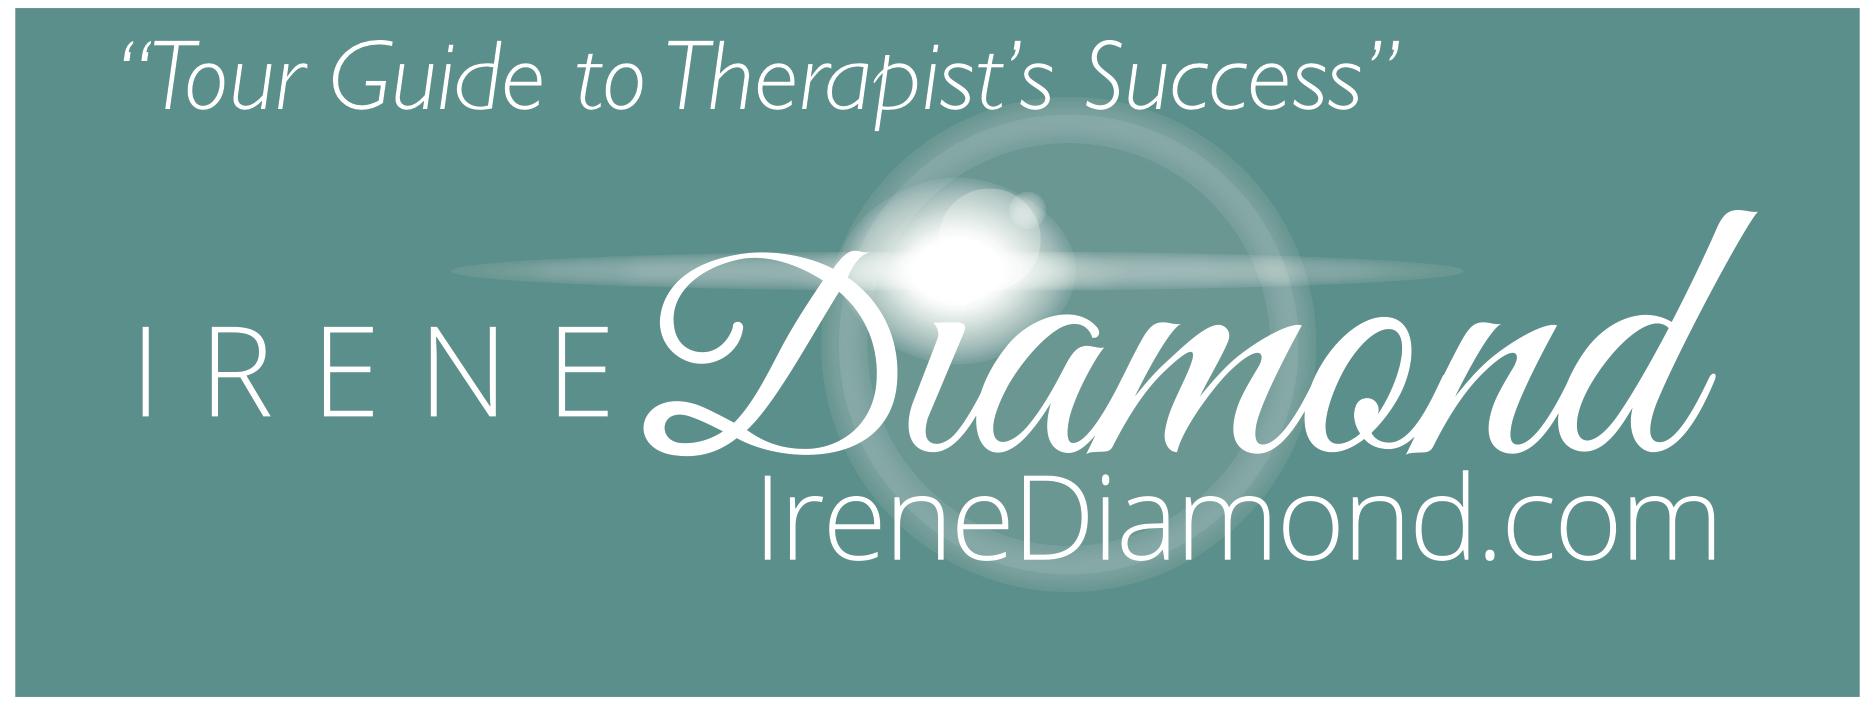 irene diamond header splash